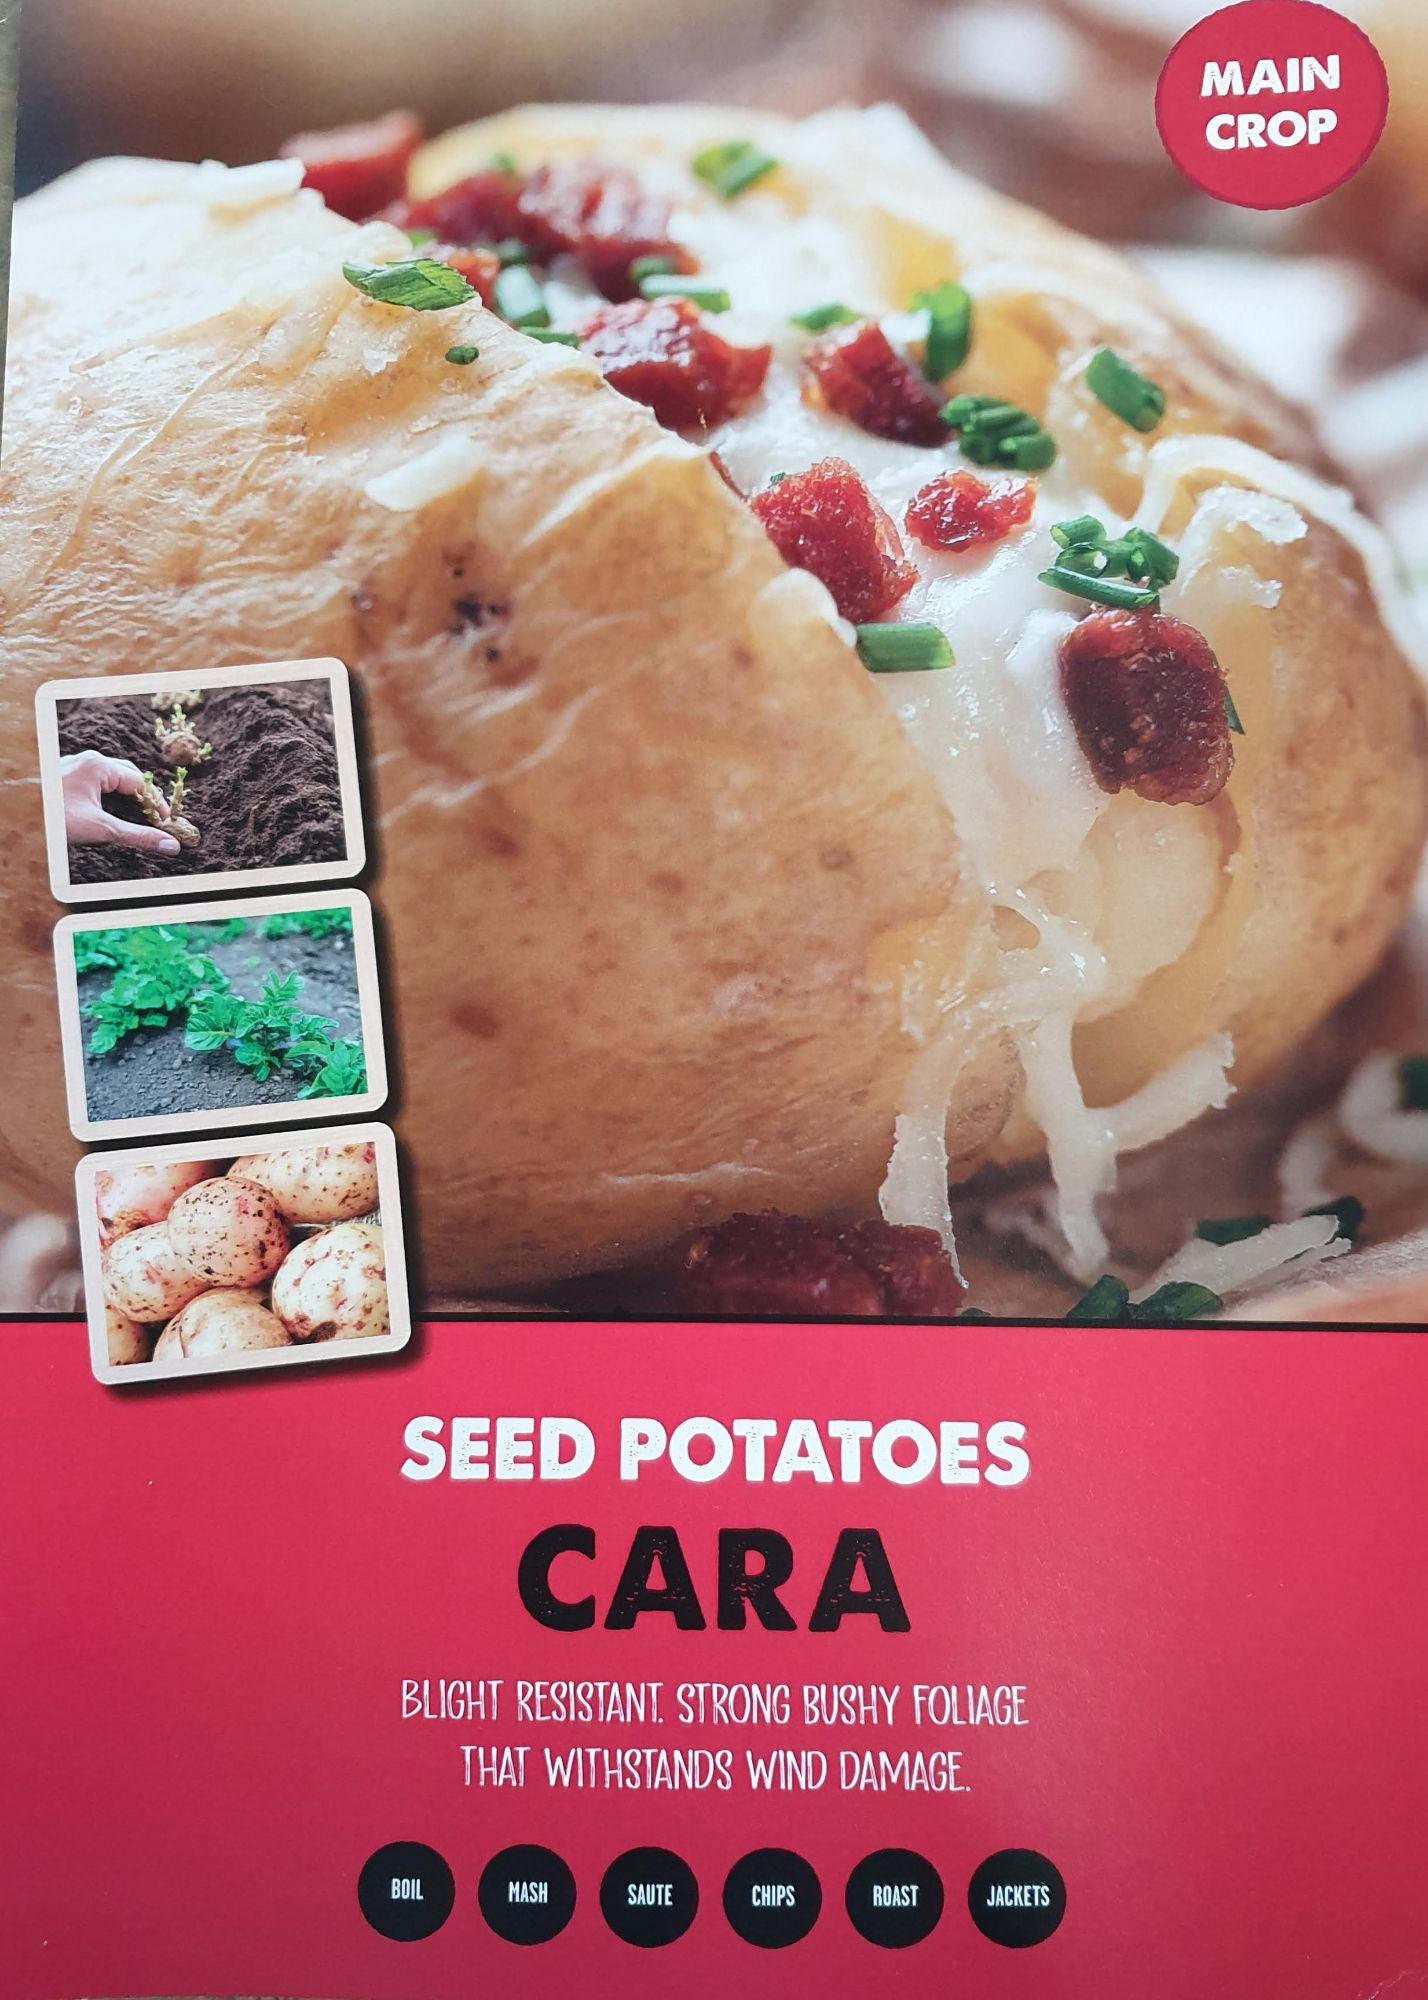 cara_seed_poato_inof.jpg